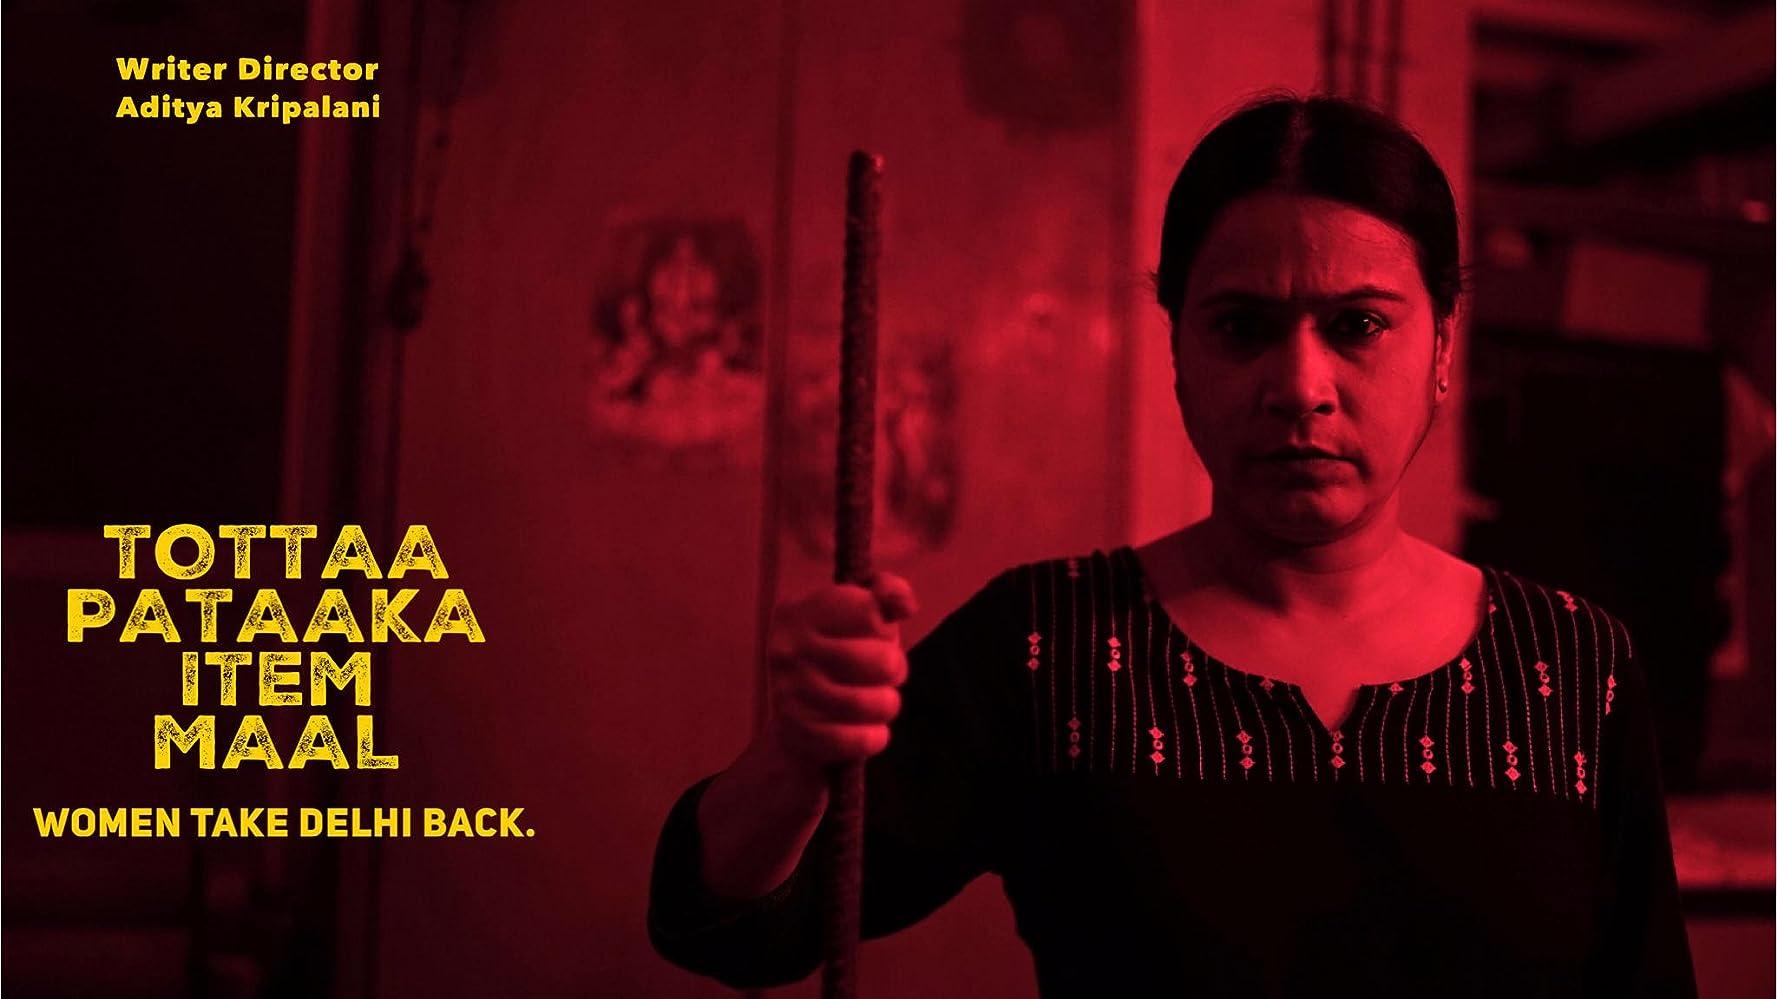 Tottaa Pataaka Item Maal (2018) Hindi Movie Watch Online Free